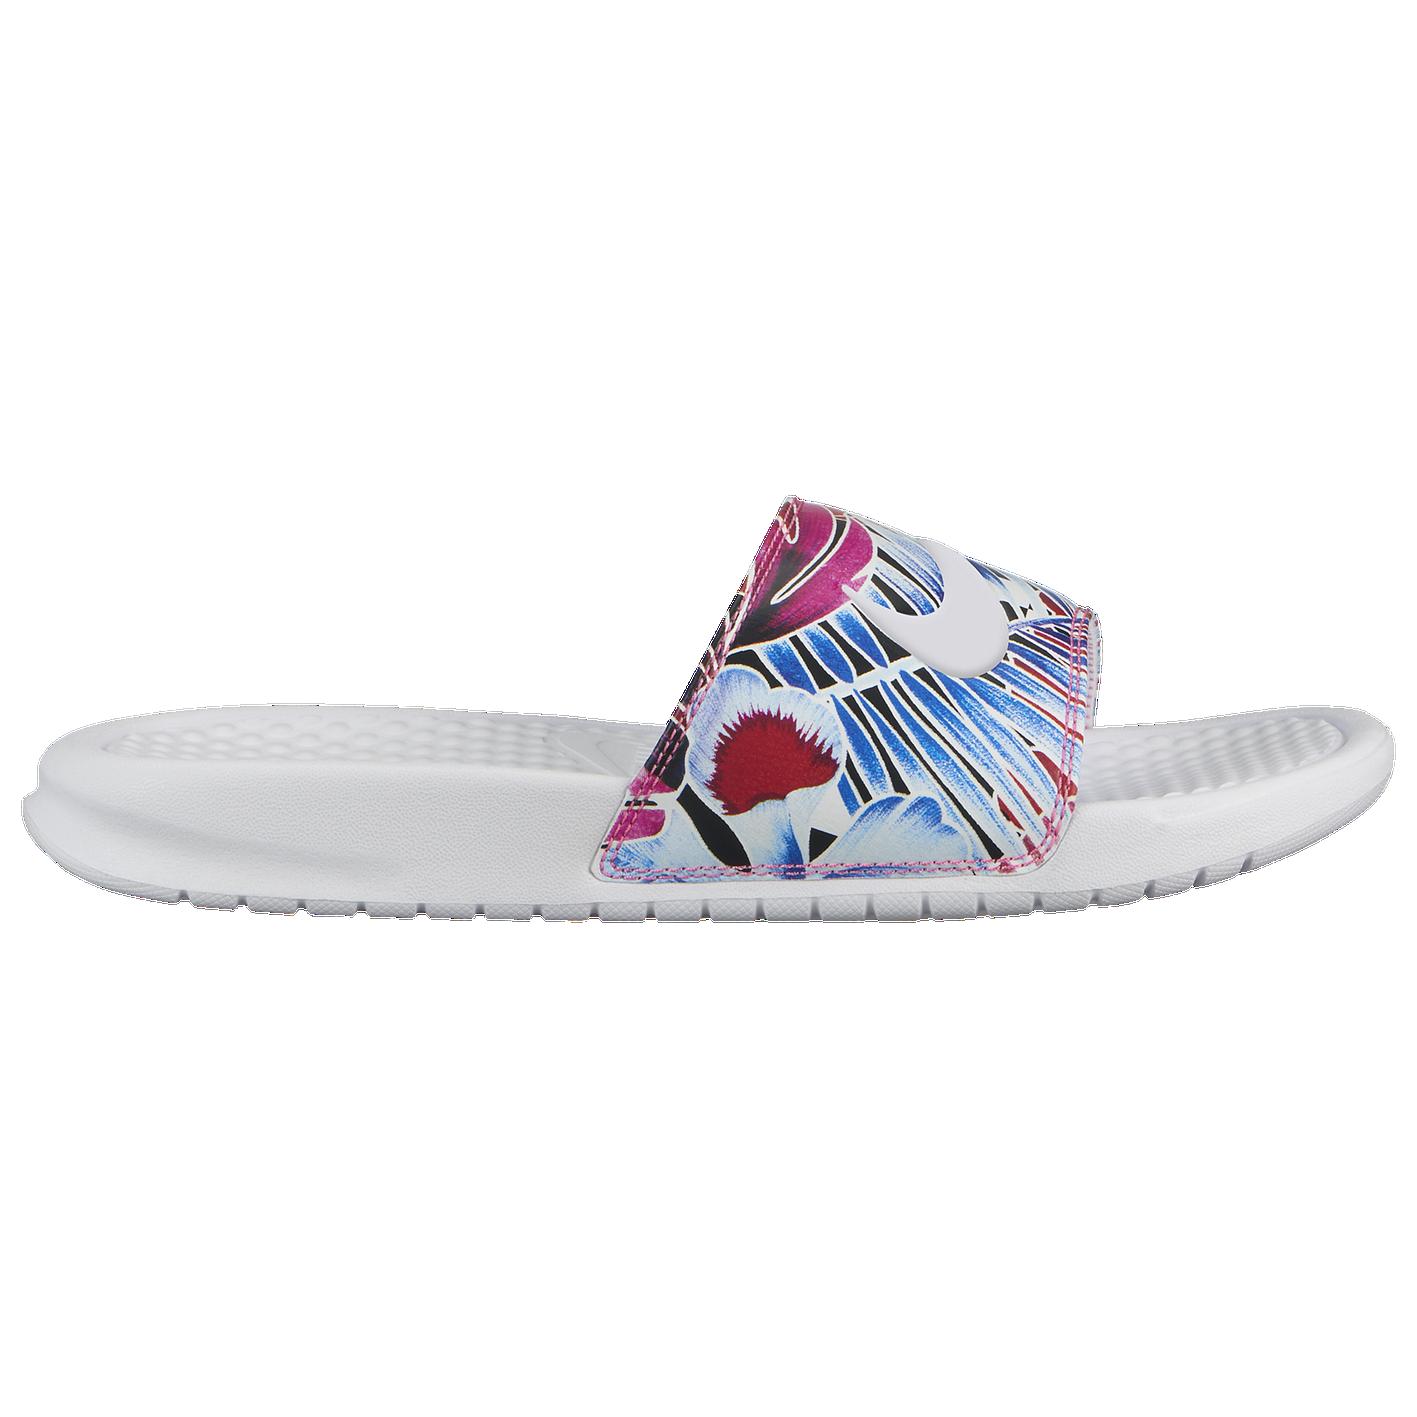 897e61e9700c Nike Benassi JDI Slide - Women s - Casual - Shoes - White Habanero Ember  Glow